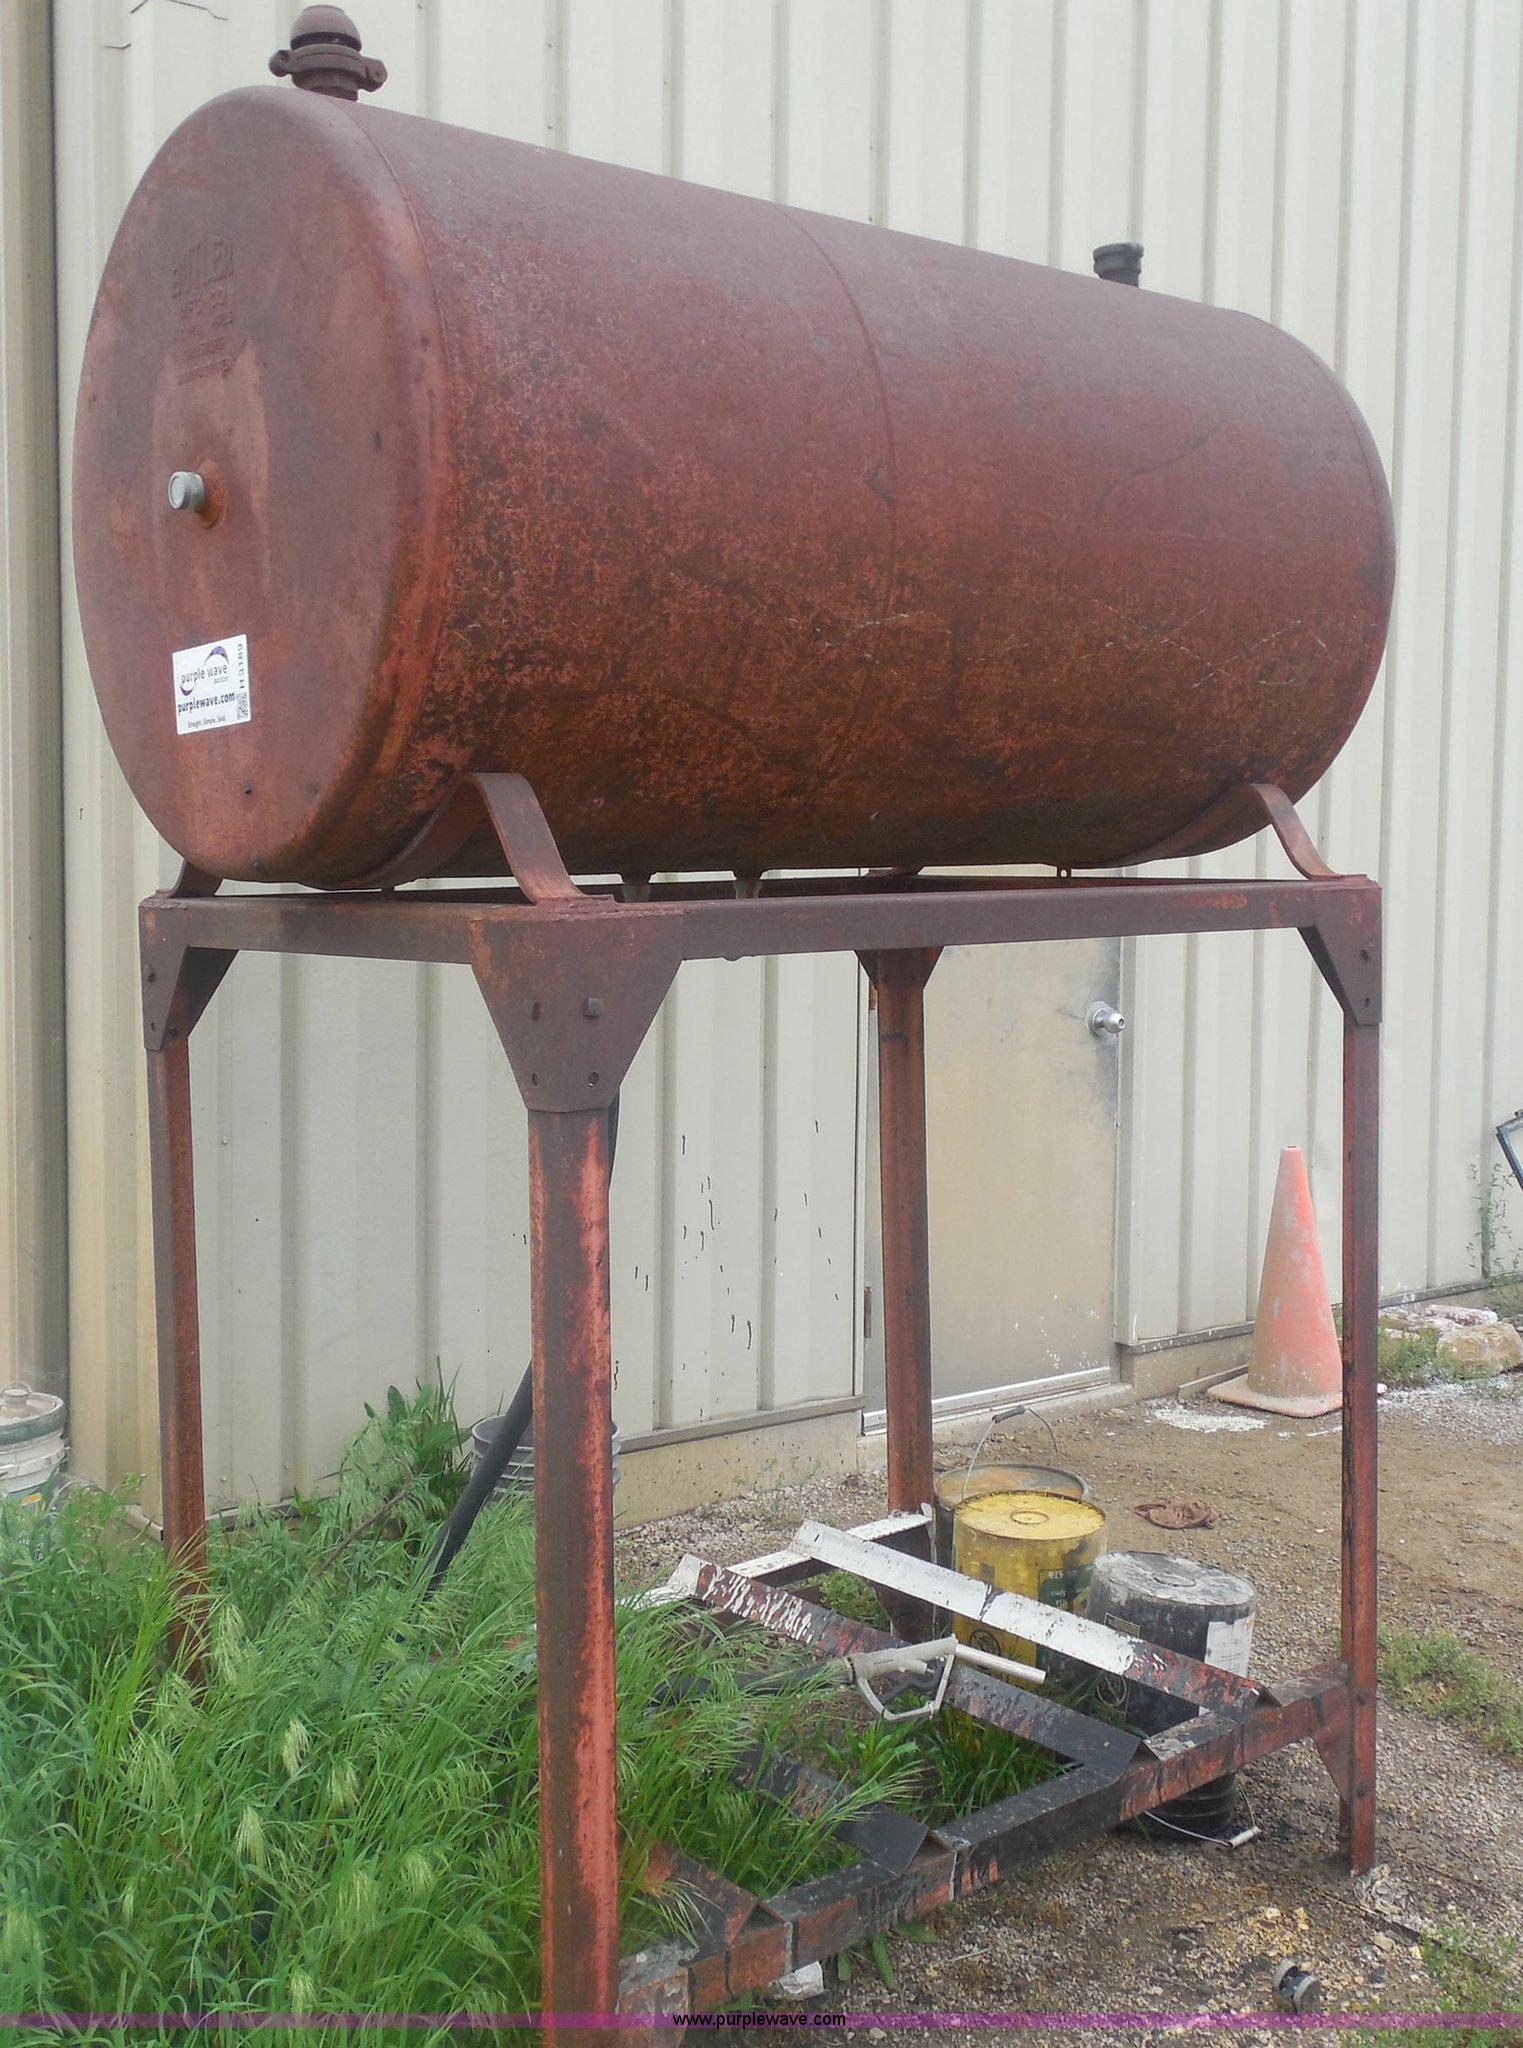 S D  Co  1946 300 gallon fuel tank | Item H3189 | SOLD! June